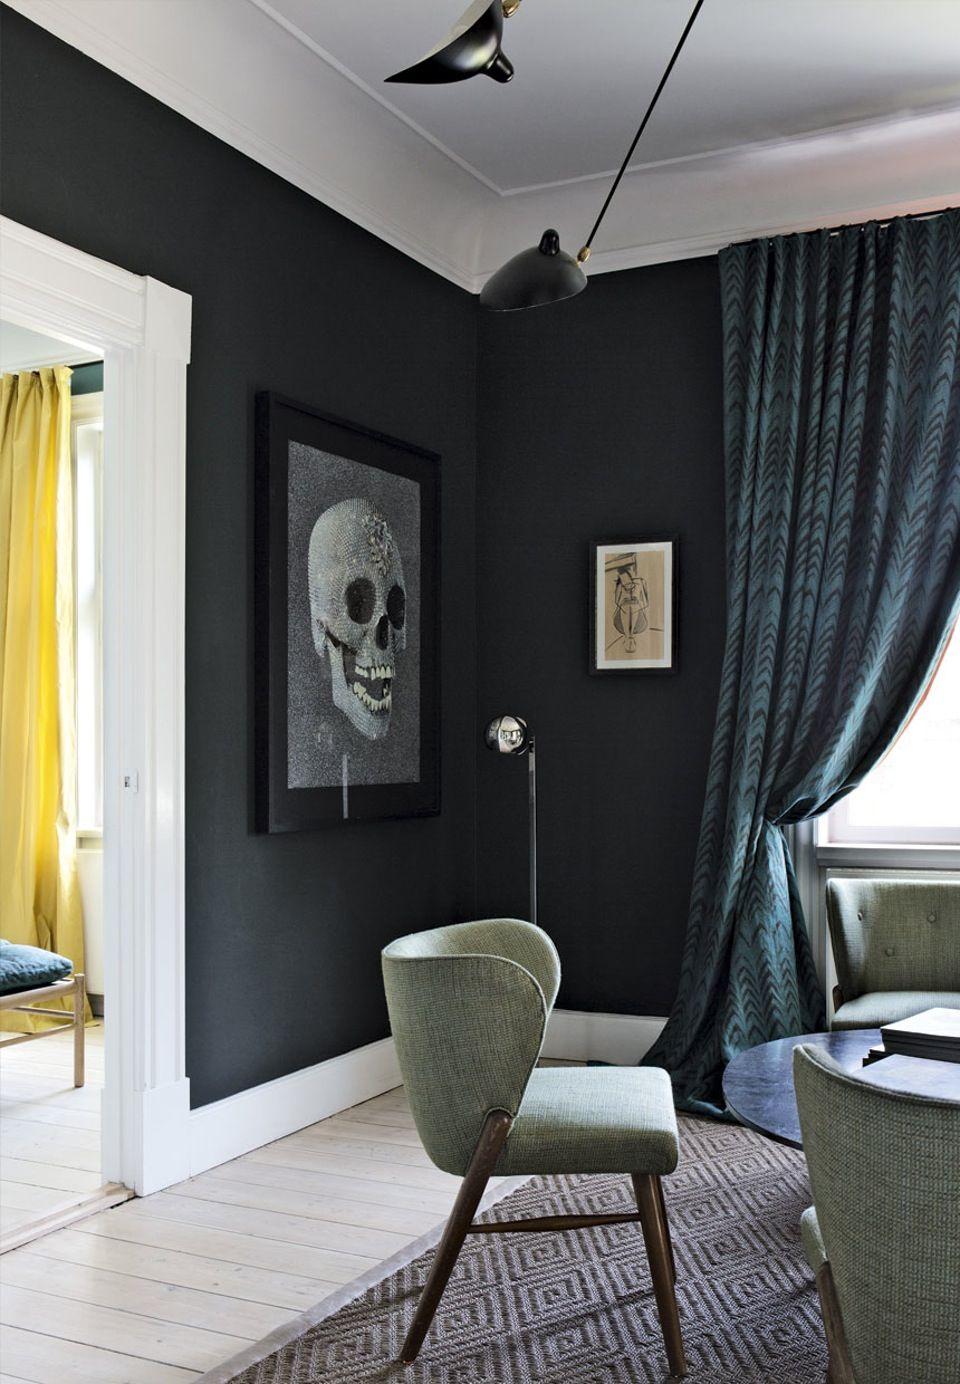 Studio Green 93 Fra Farrow Ball Wallpaper Painting